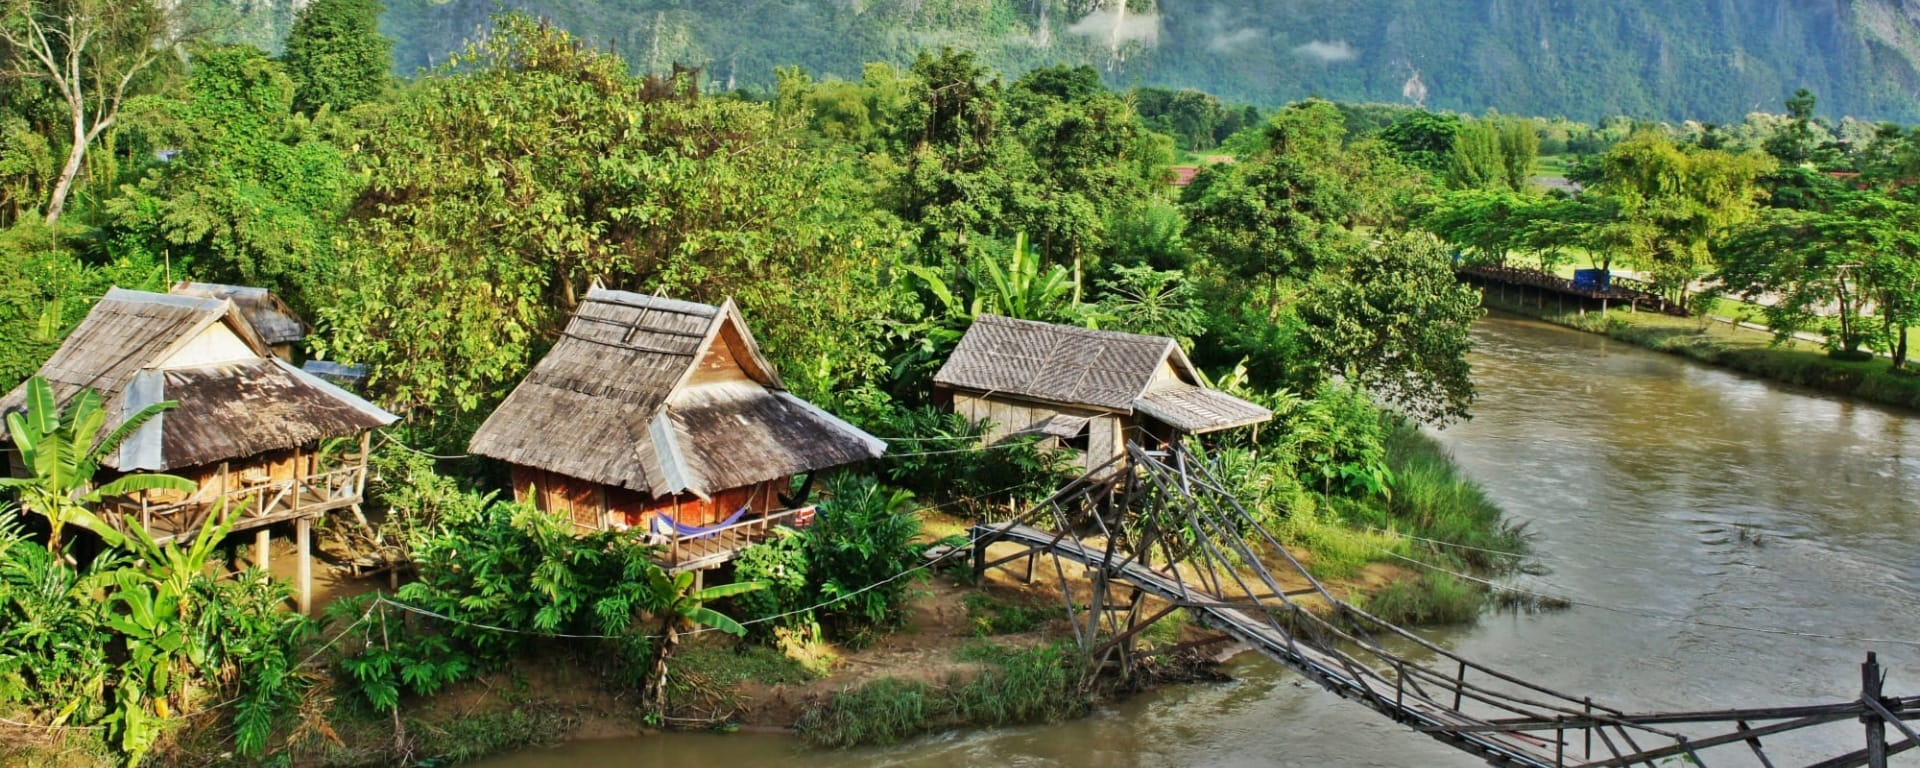 Überland von Luang Prabang nach Vientiane: Laos Vang Vieng